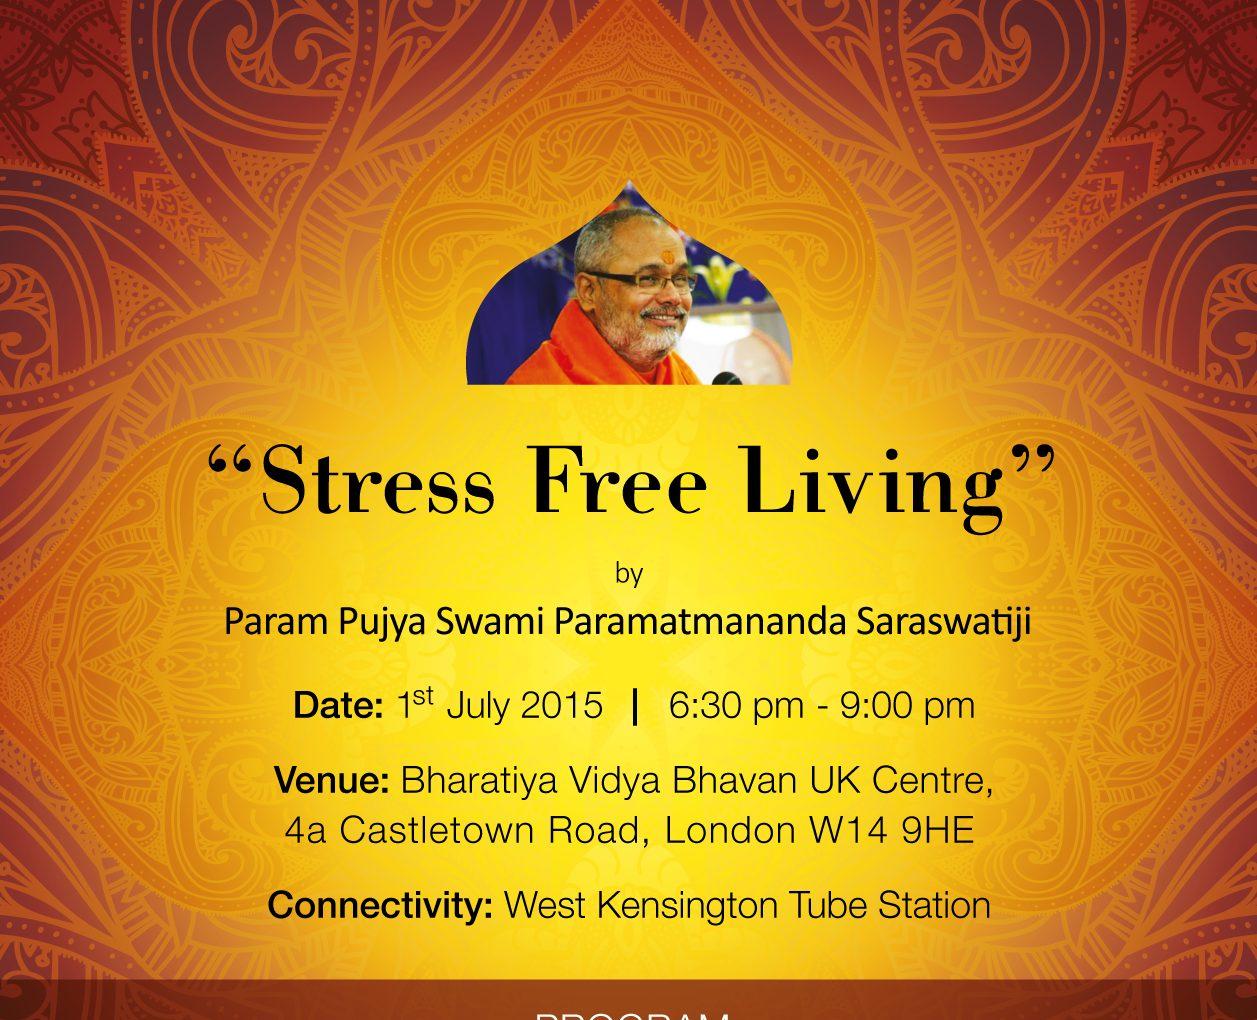 Stress Free Living